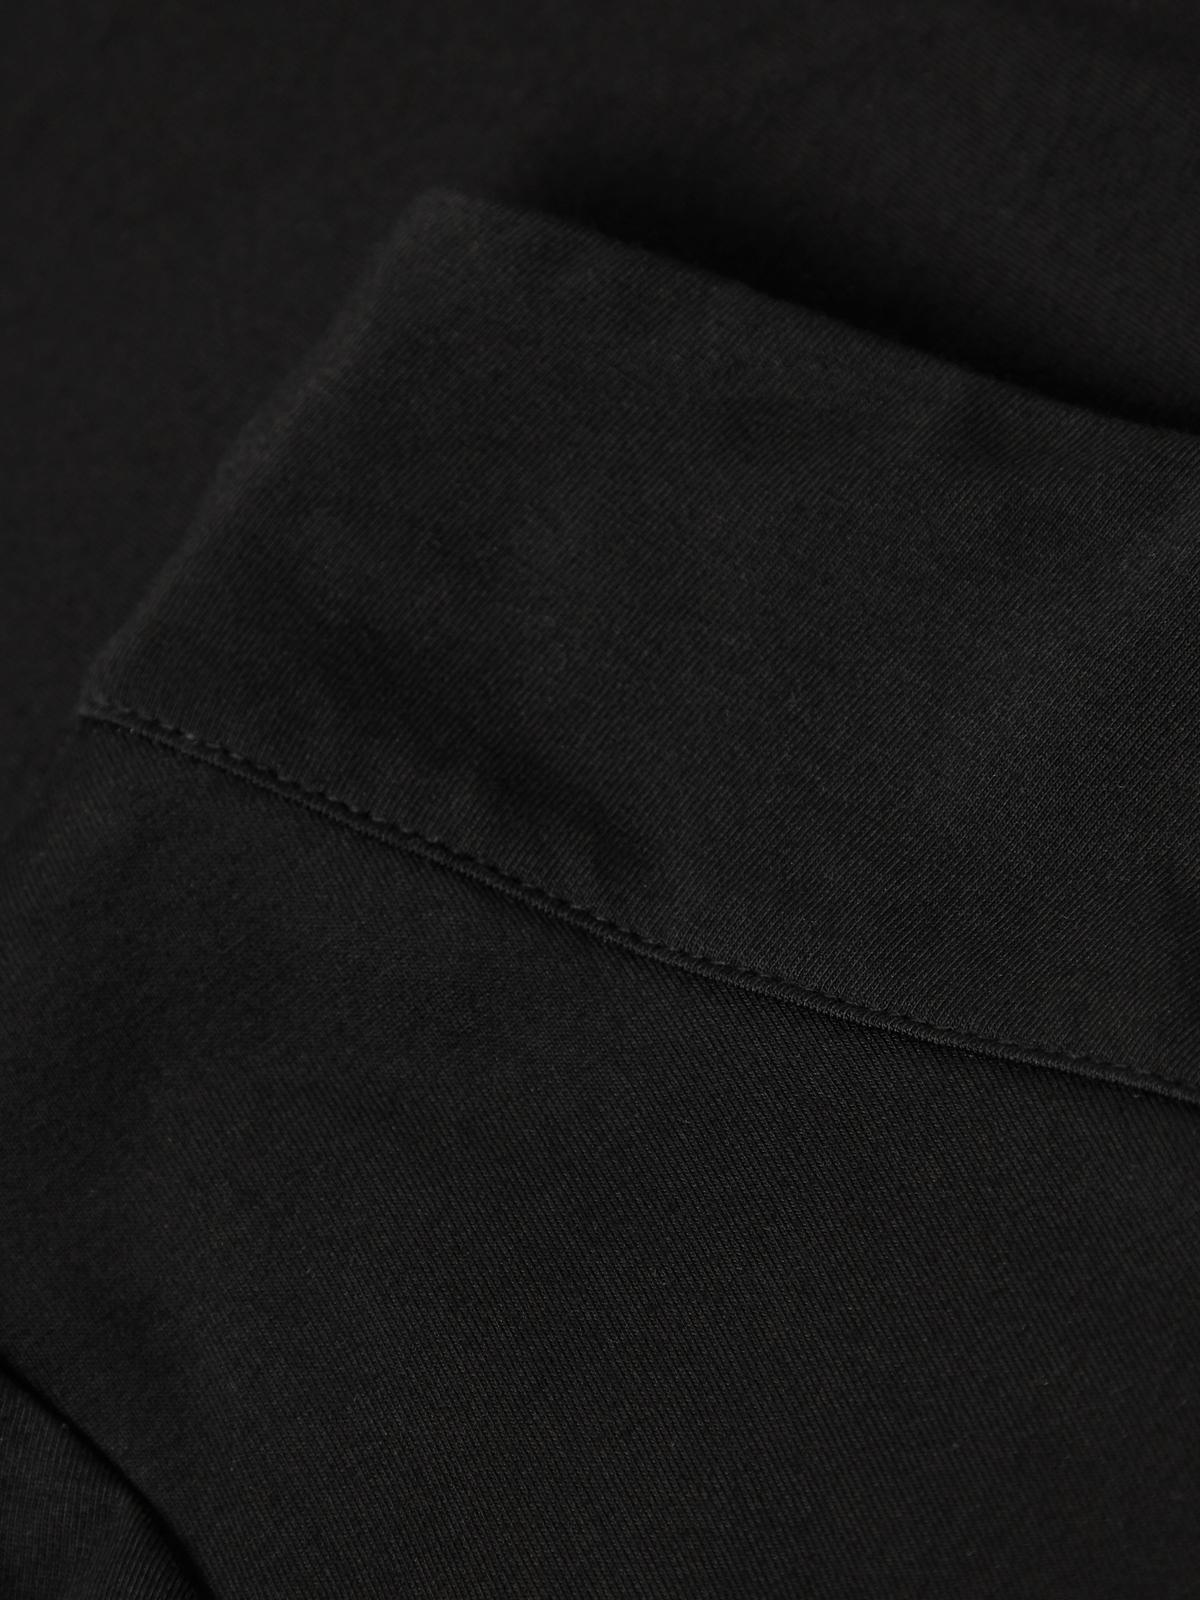 One Shoulder Short Sleeve Tee Black